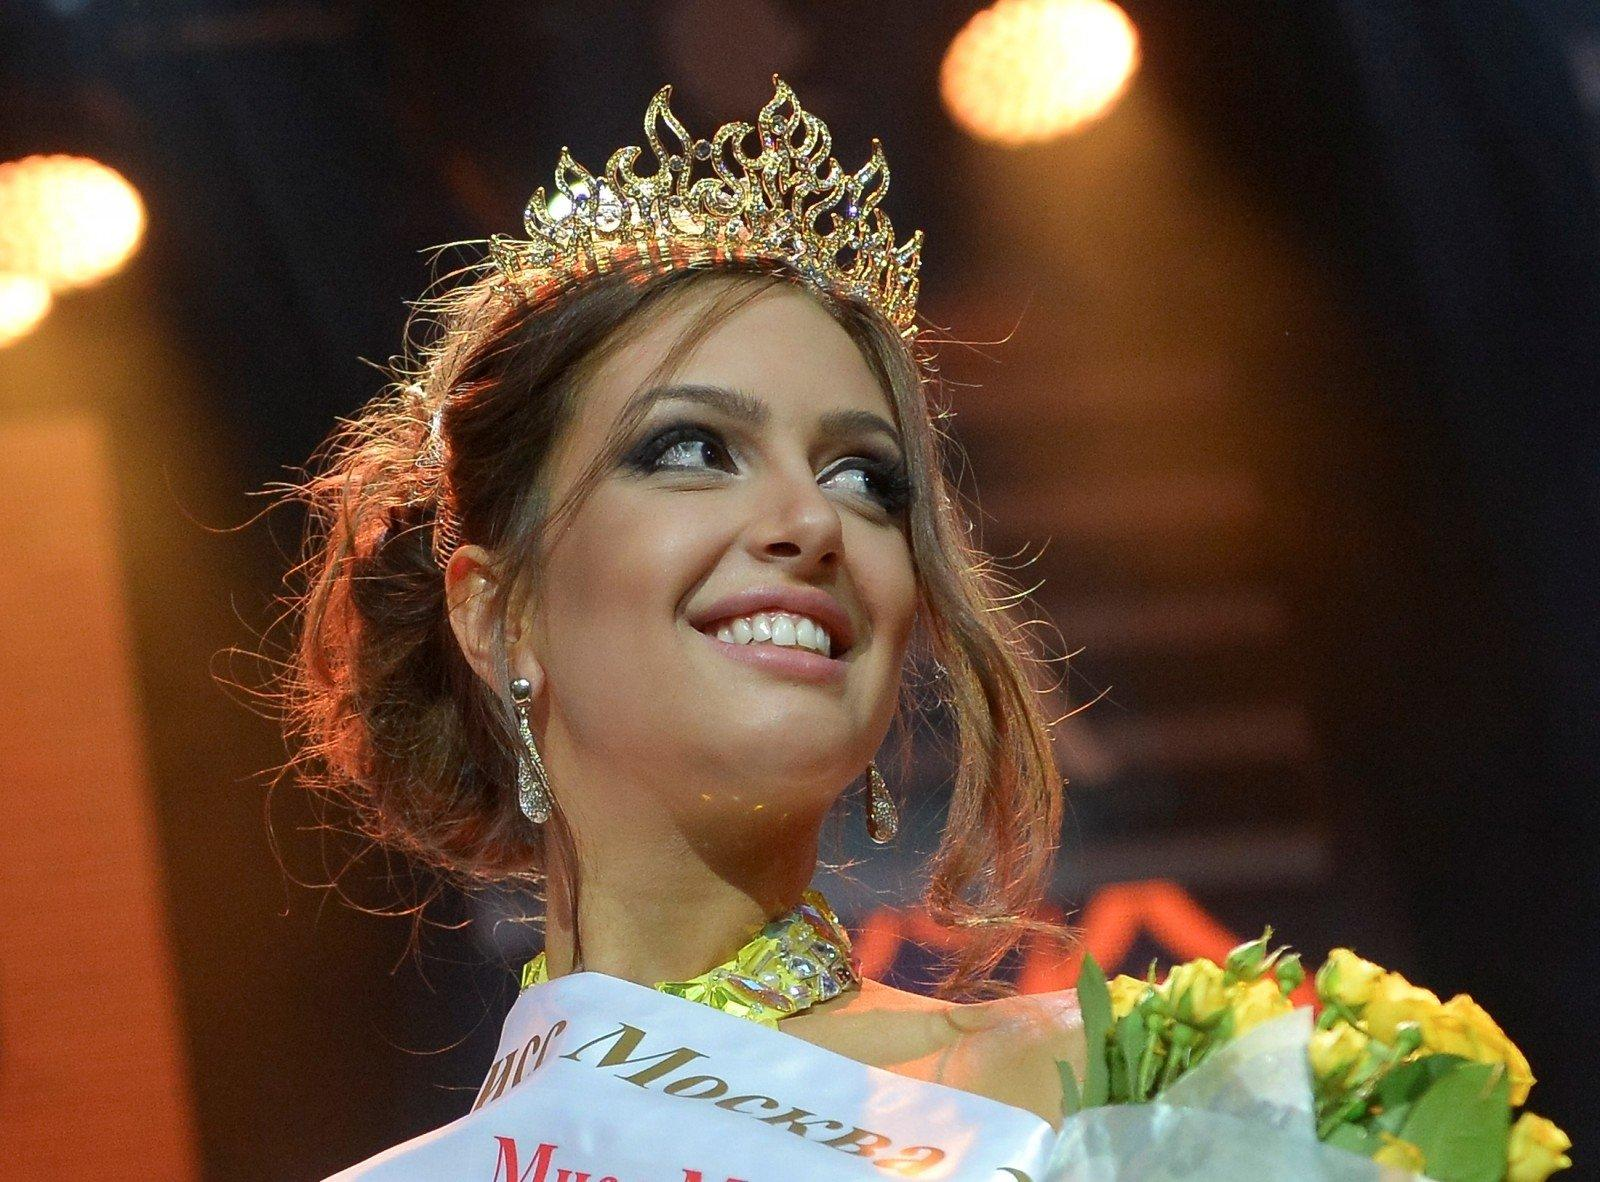 Юбилейный конкурс красоты «Мисс Москва 2020» уходит в онлайн